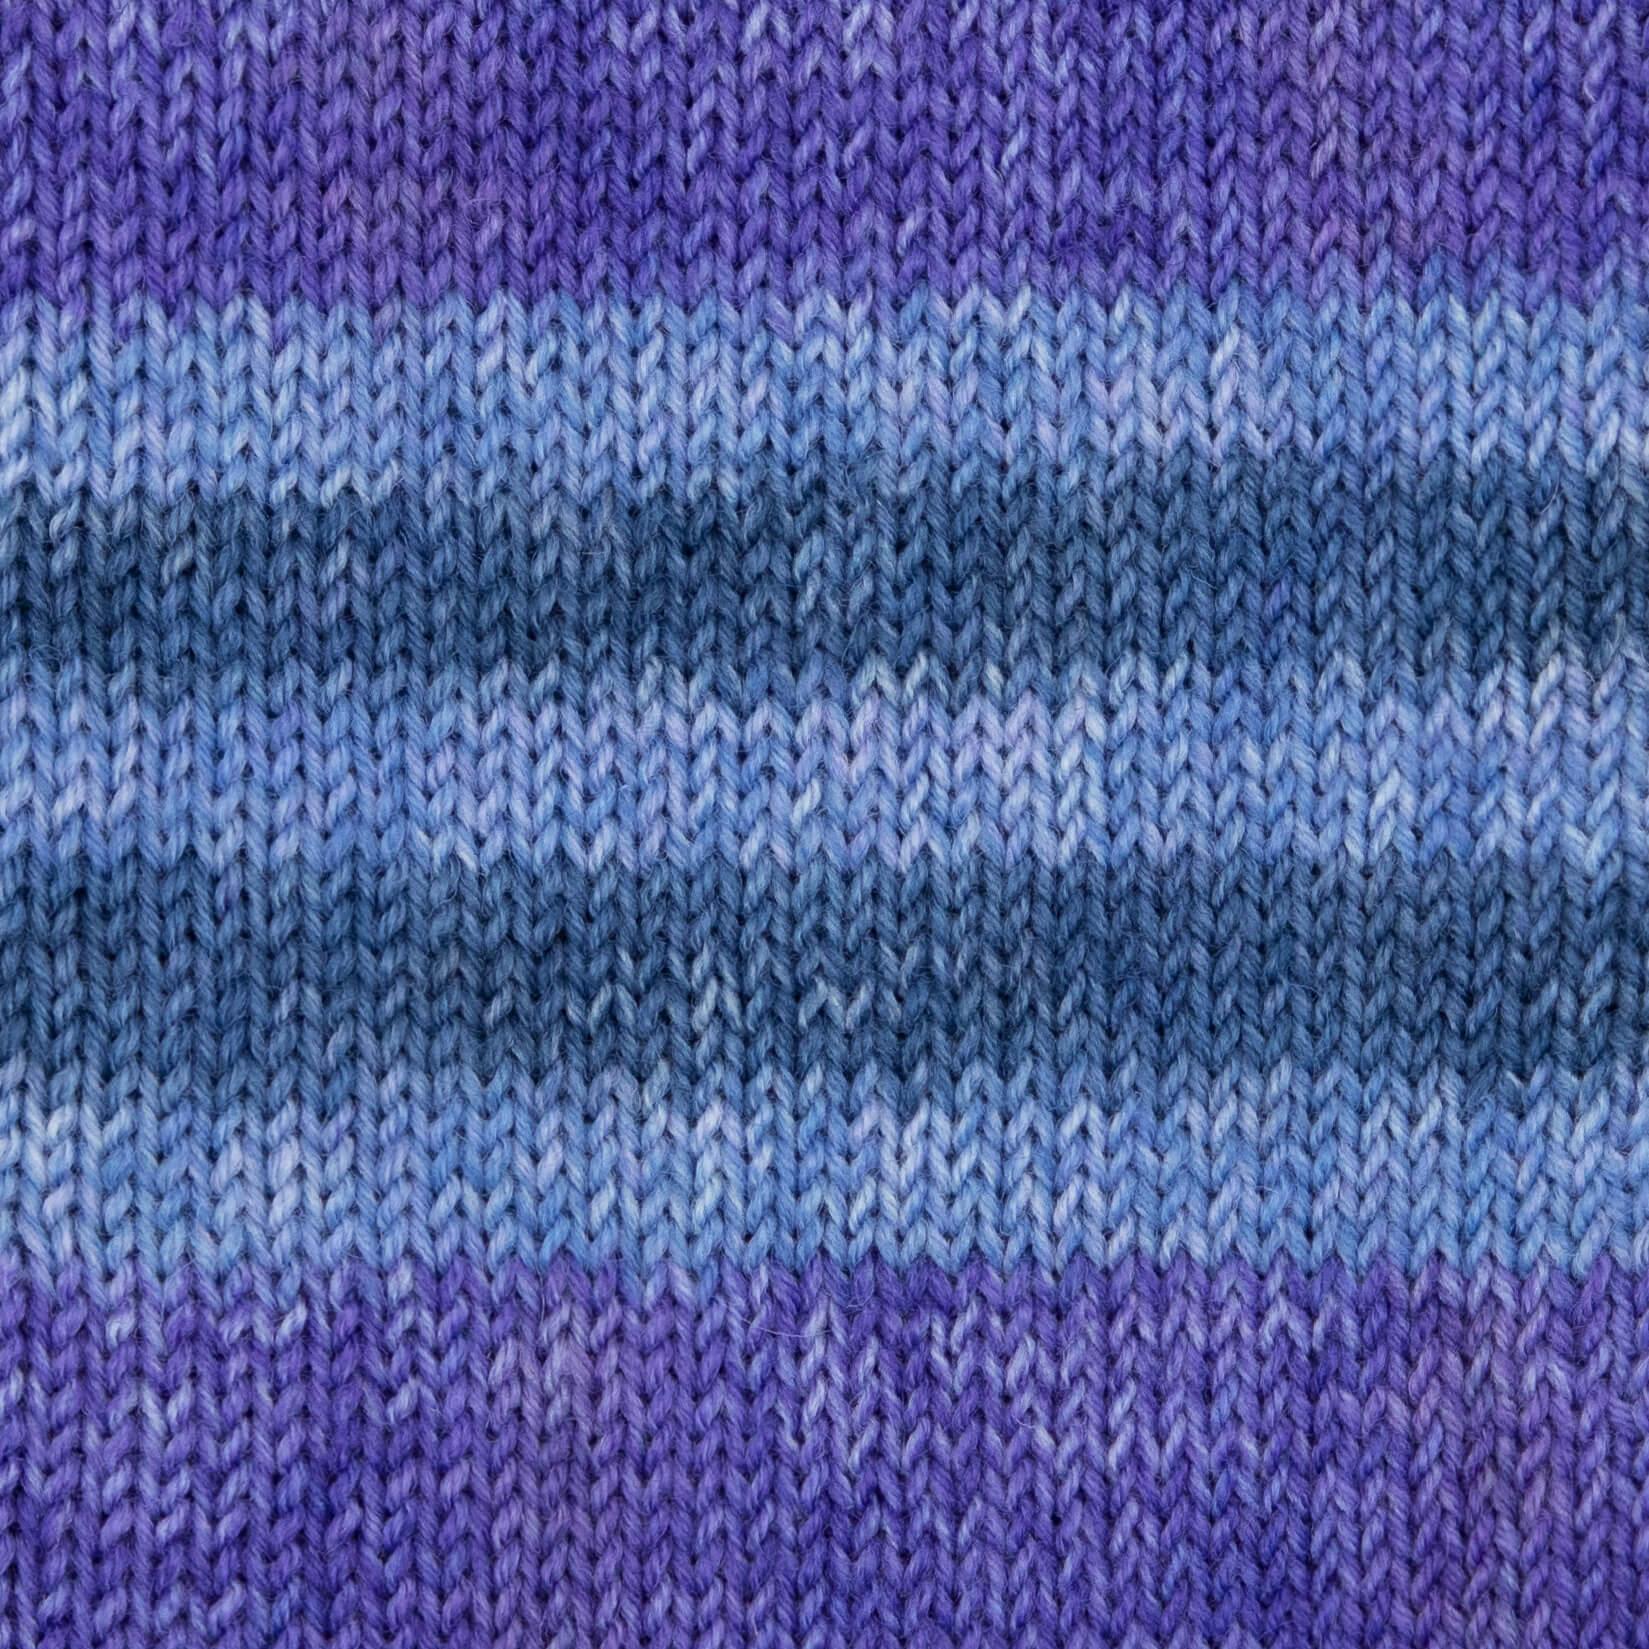 violett-blau-meliert